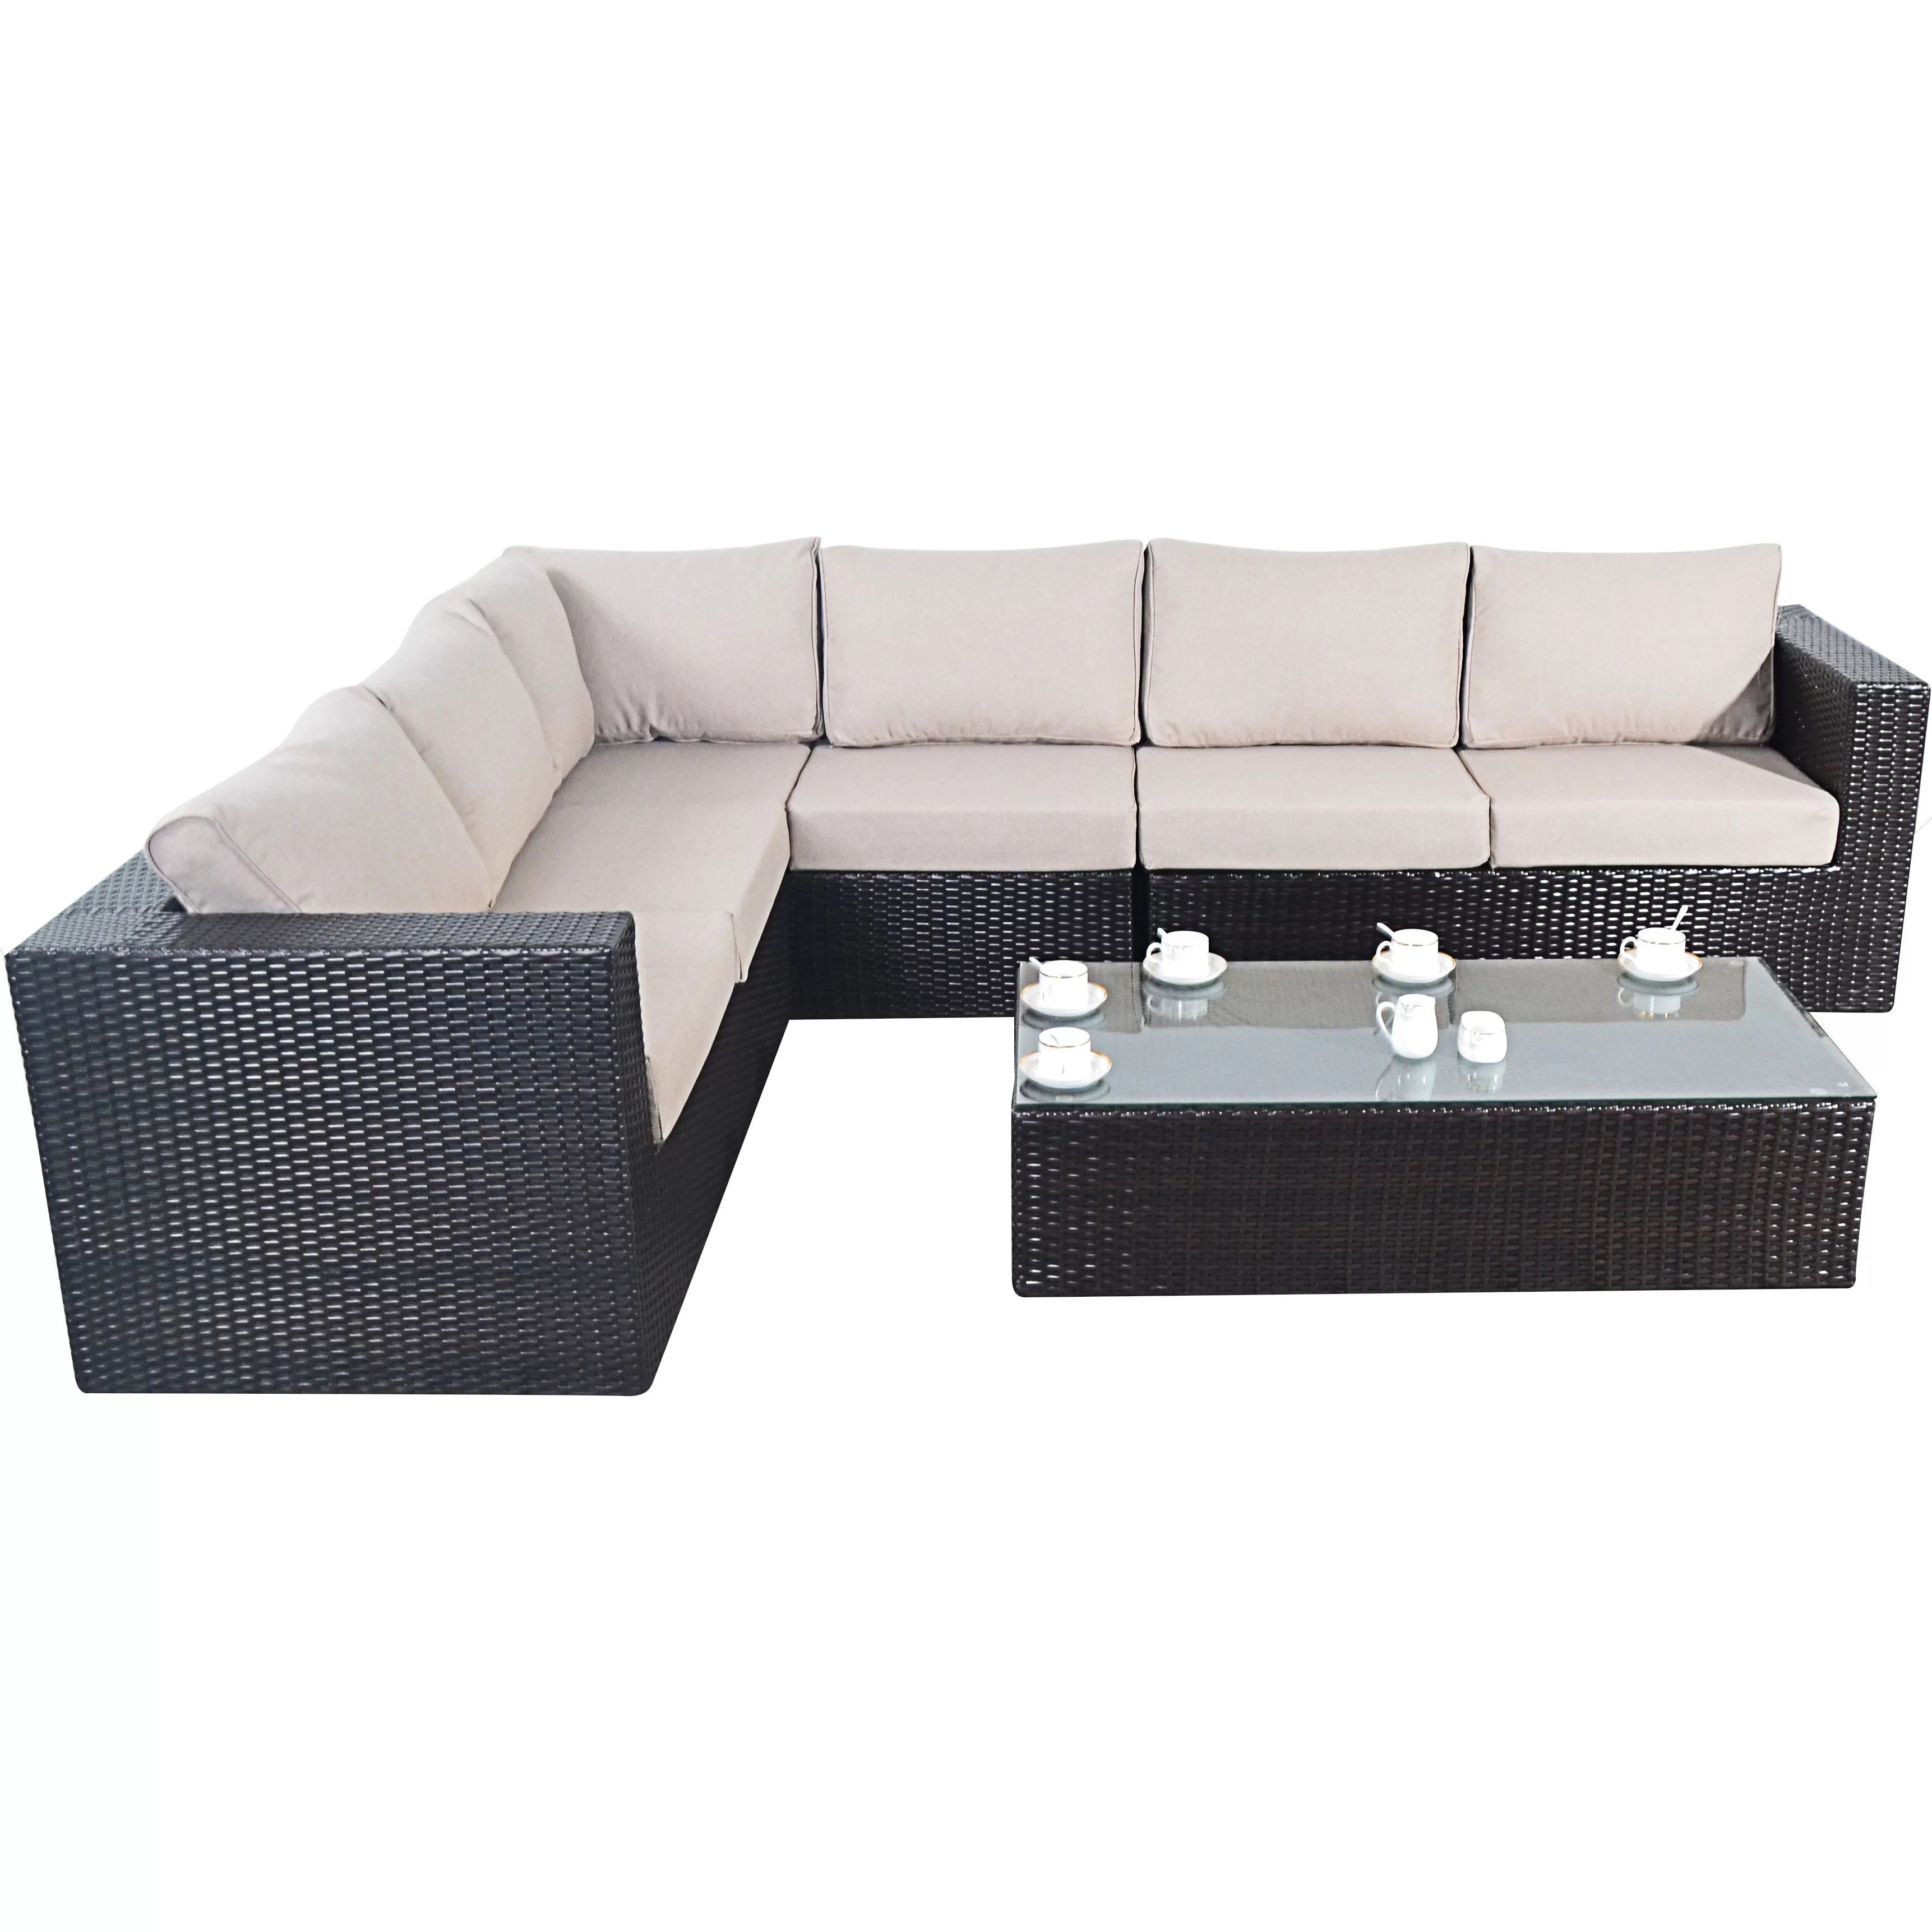 refilling sofa cushions maze rattan peach daybed set home the honoroak